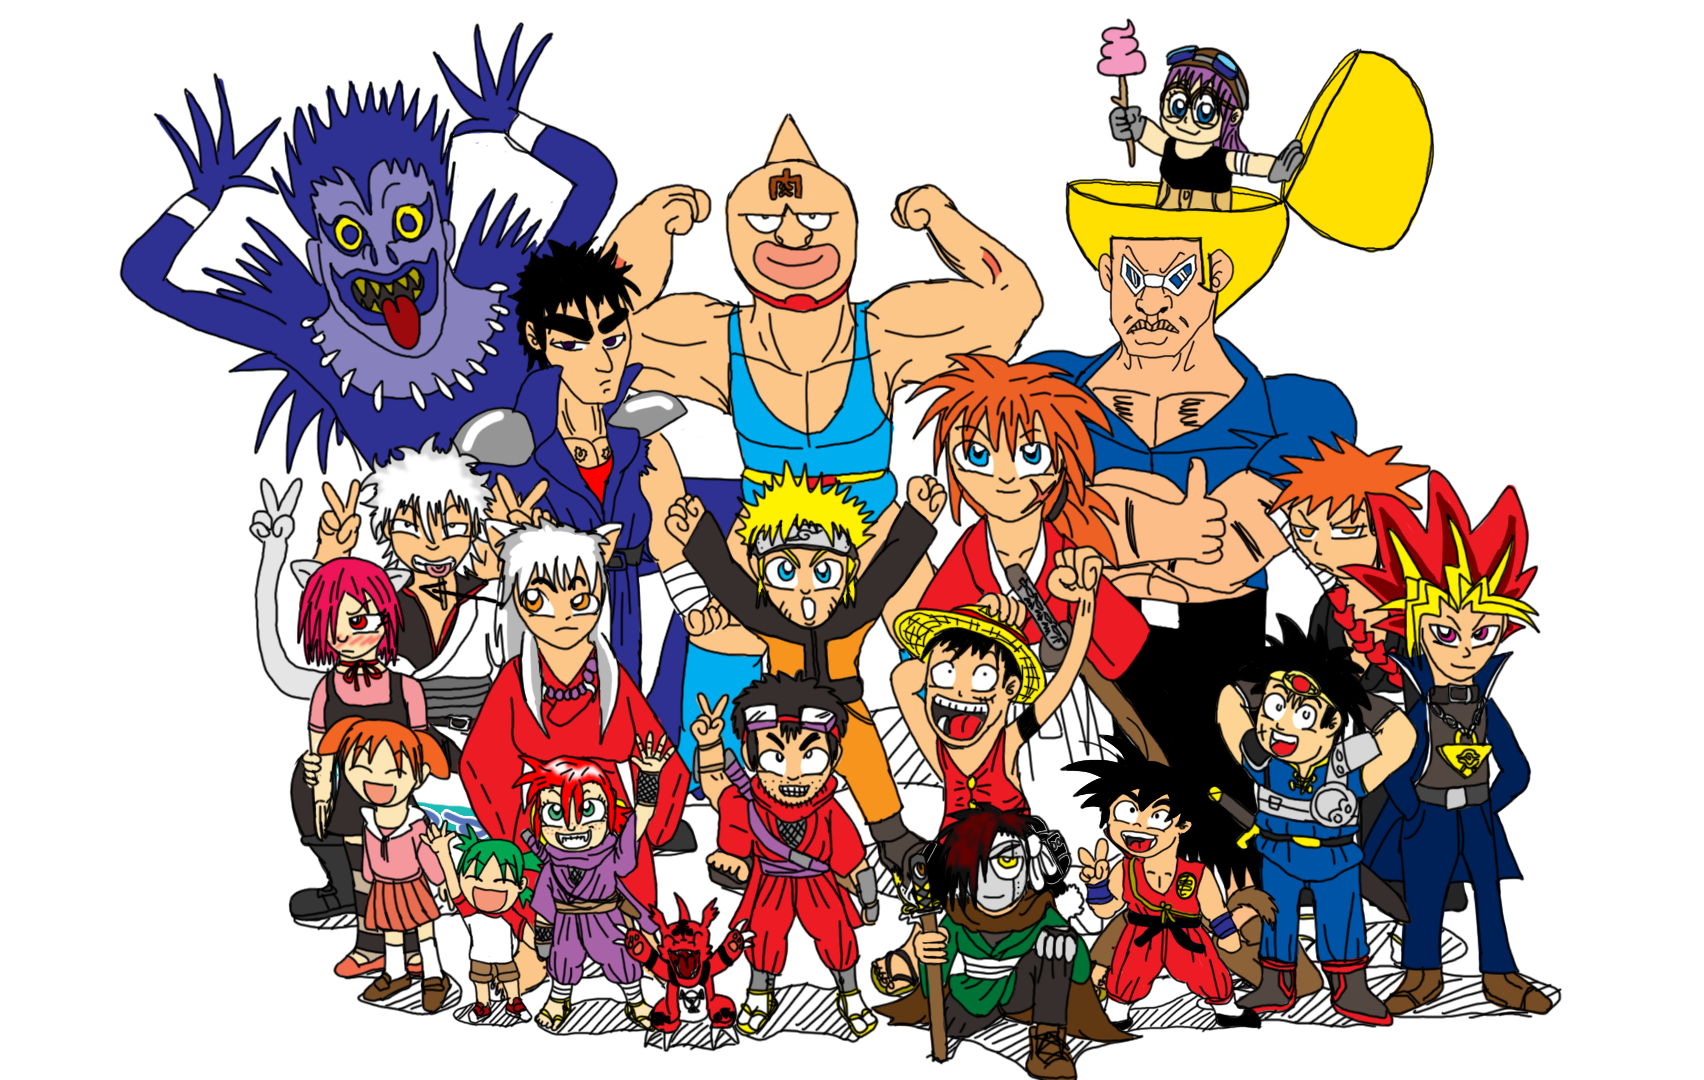 Anime and Manga group shot by SHINOBI-03 on DeviantArt